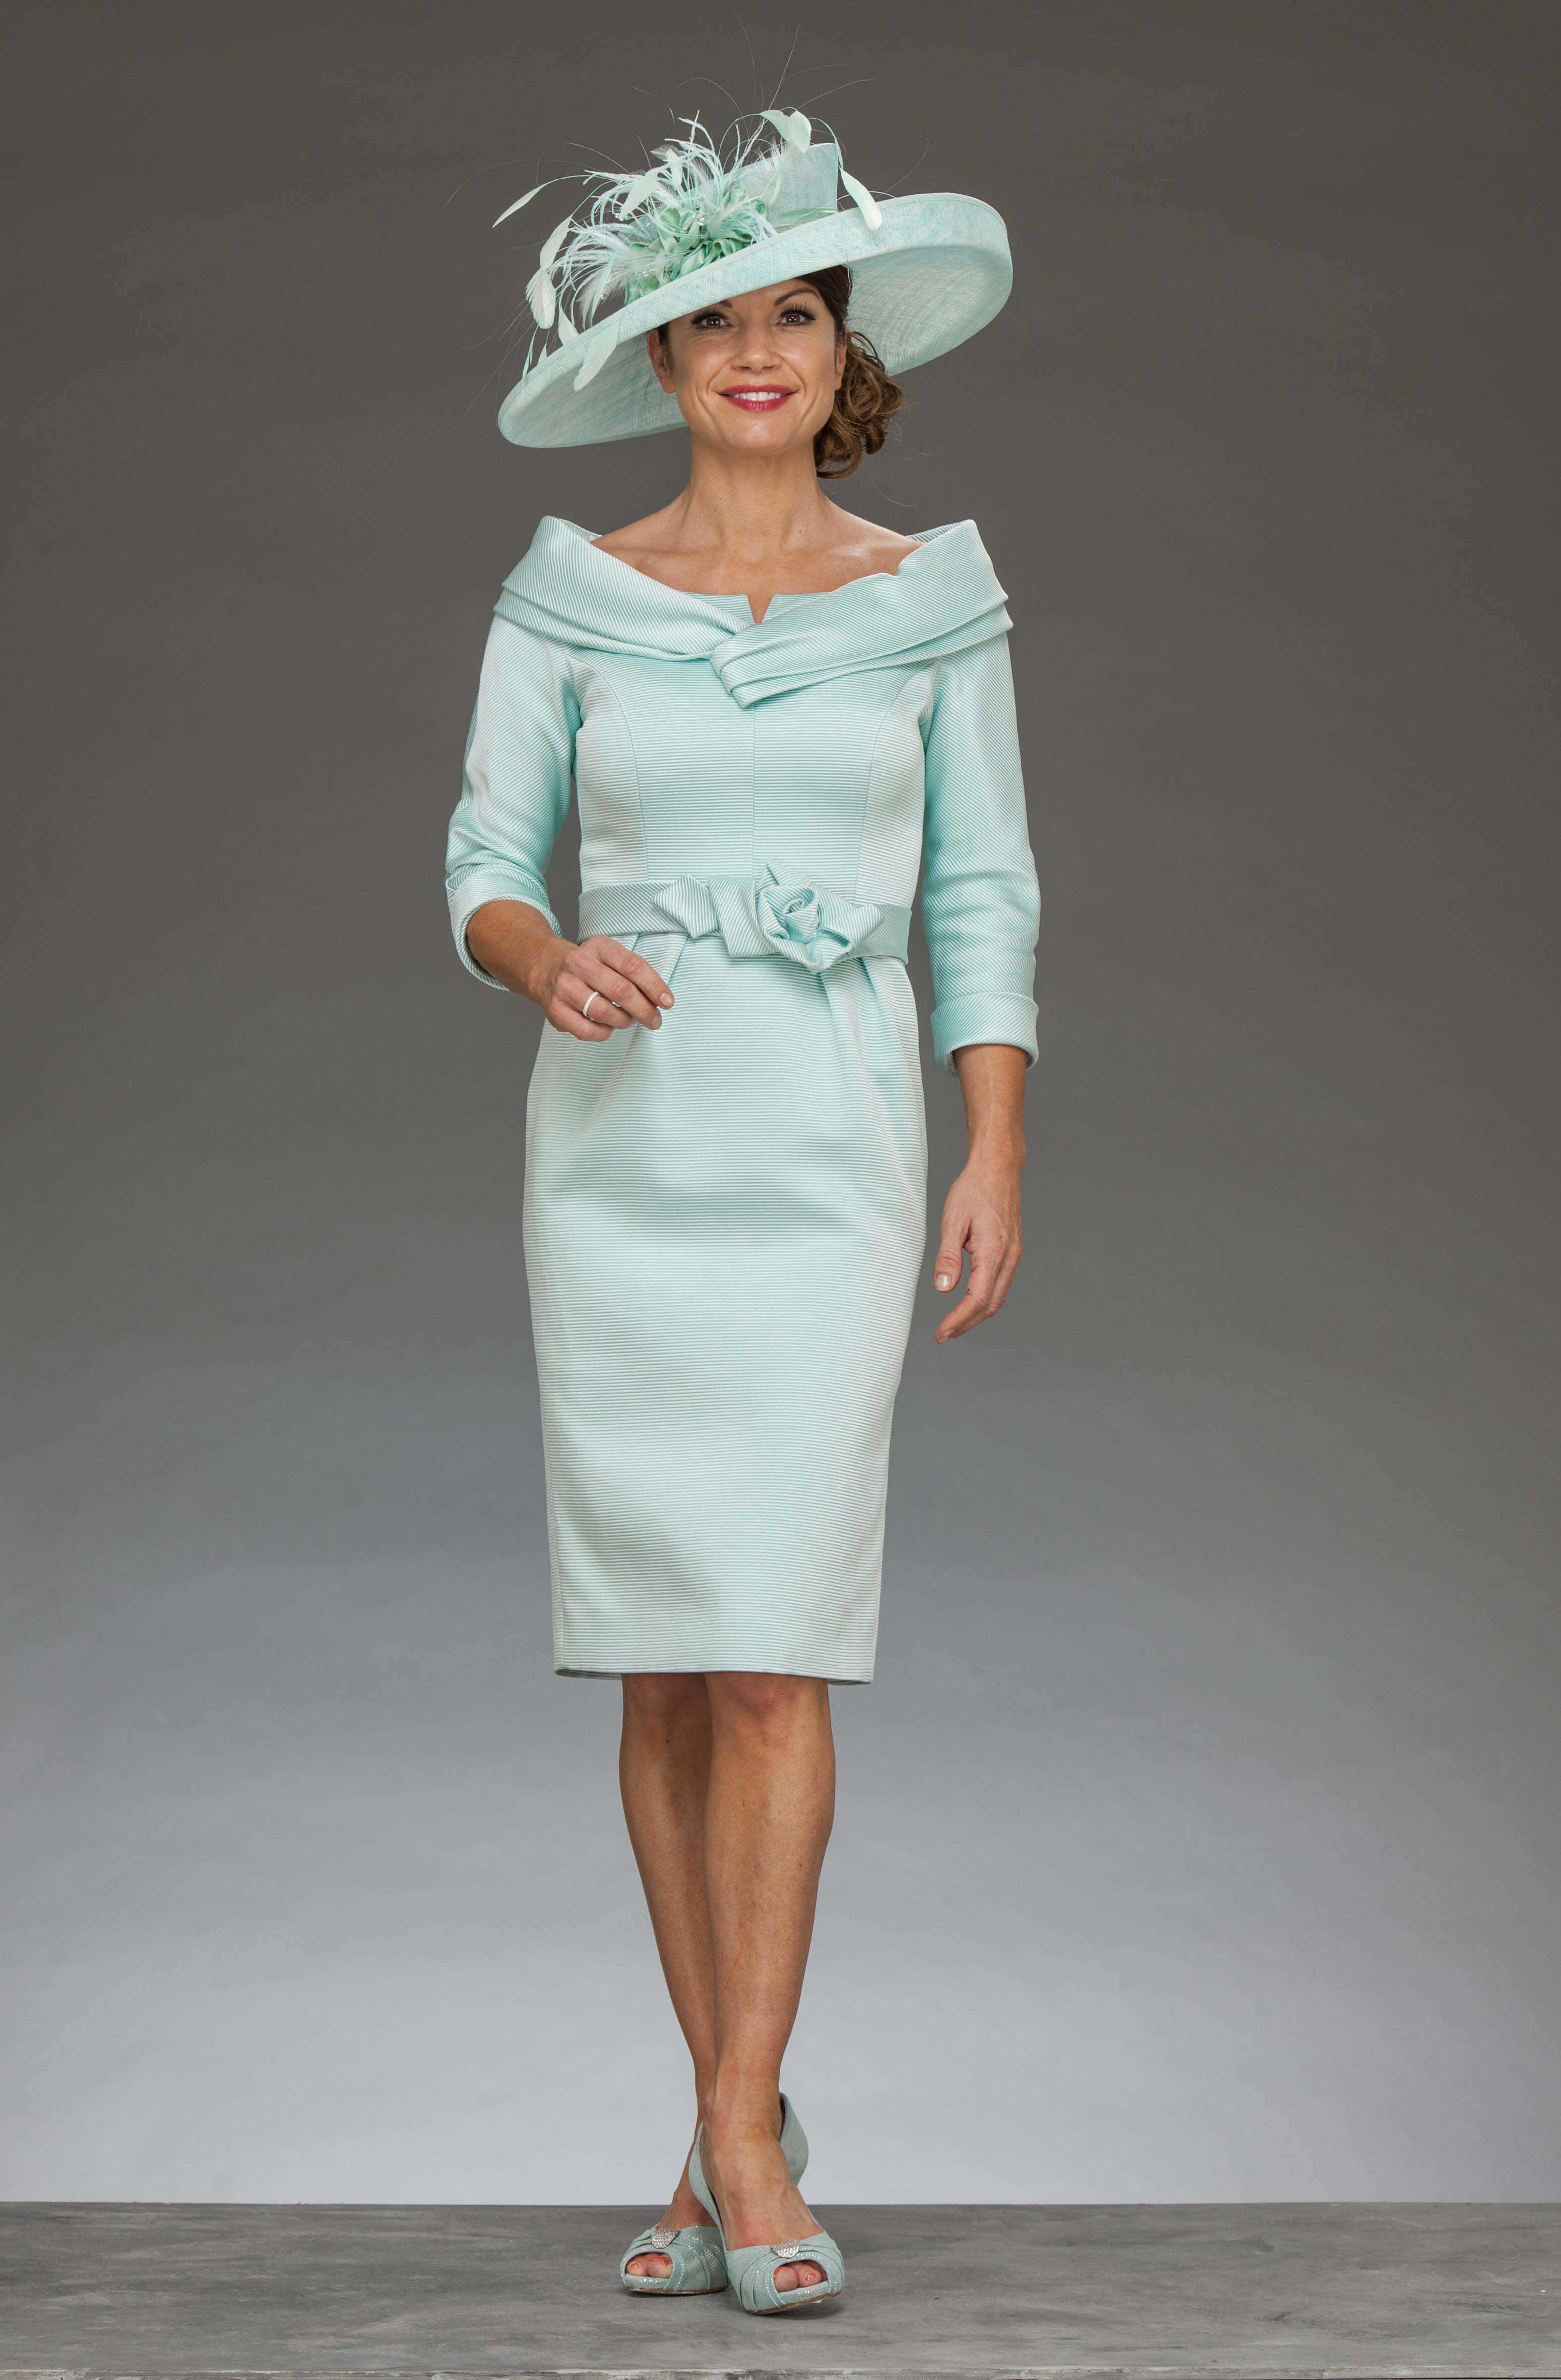 catherines-2970-t-ripol-3242 | ropa madrina boda | Pinterest ...